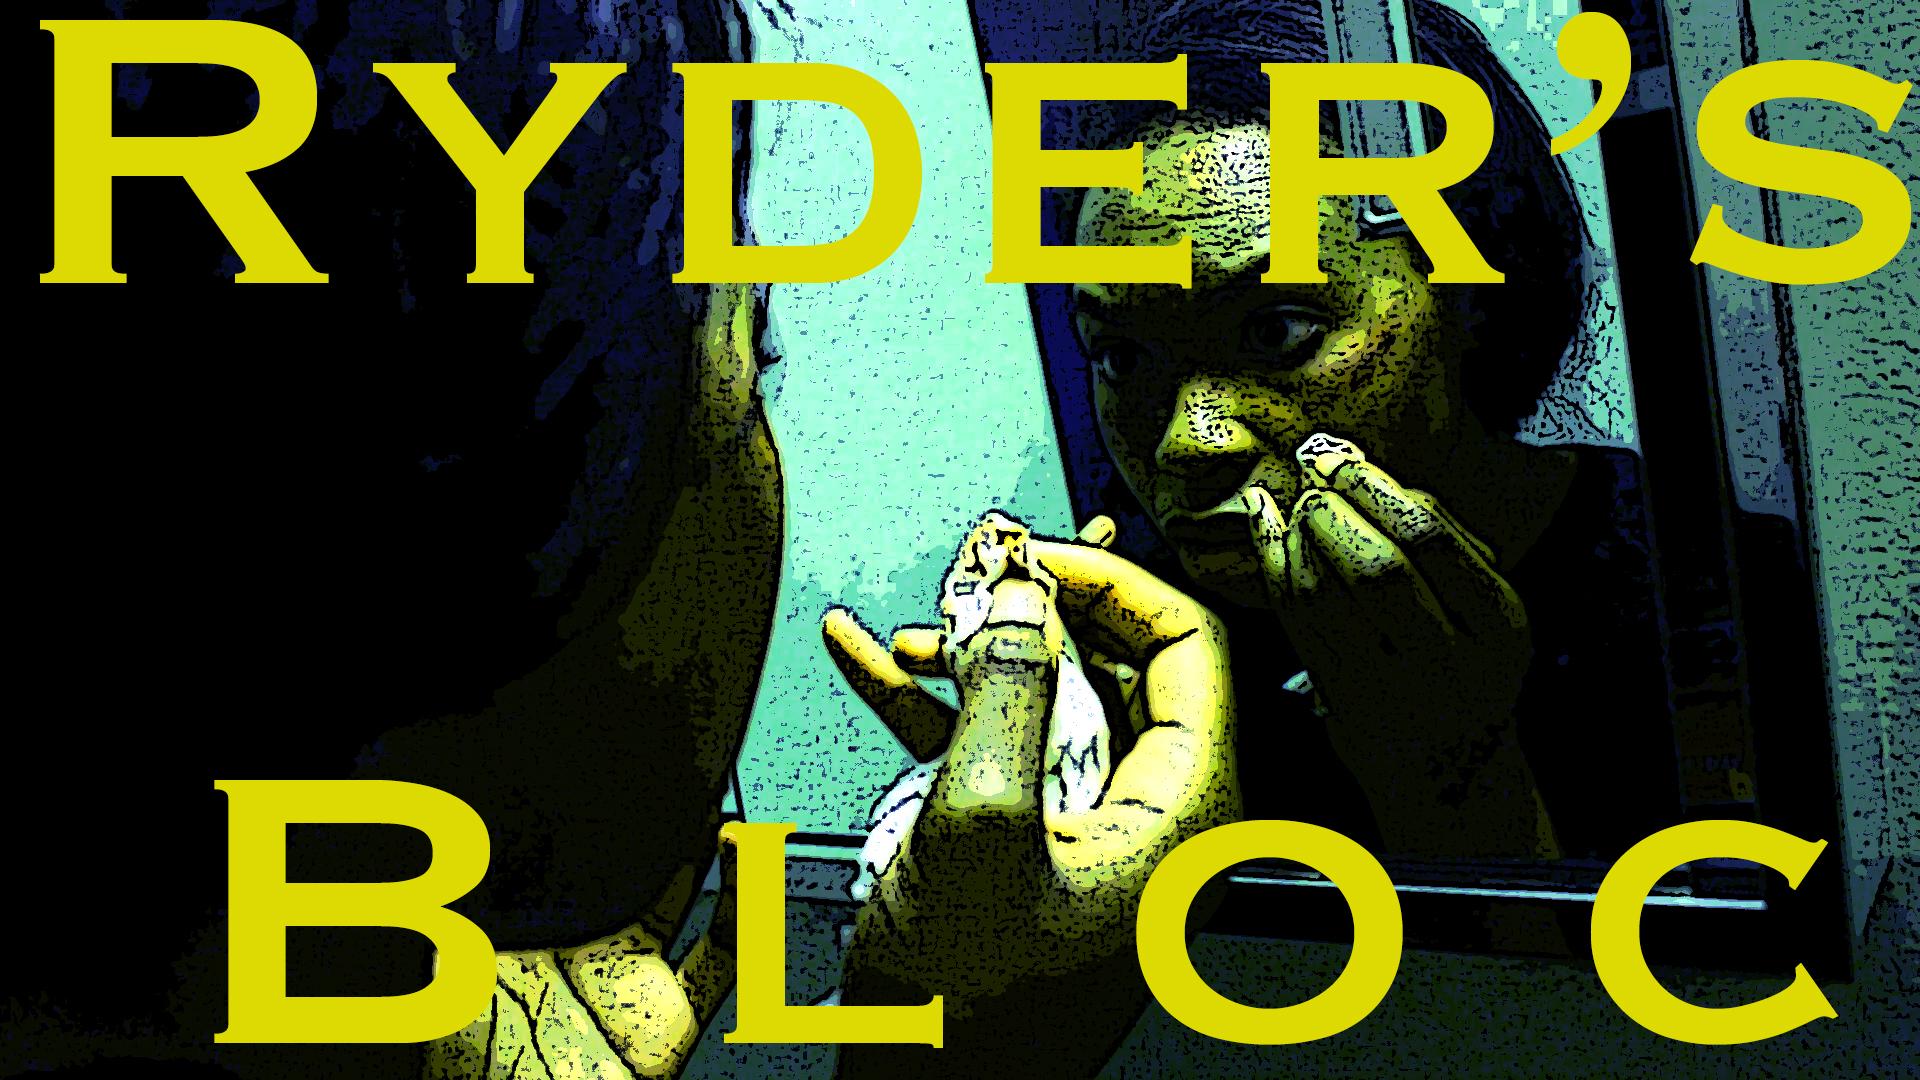 Ryder's Bloc